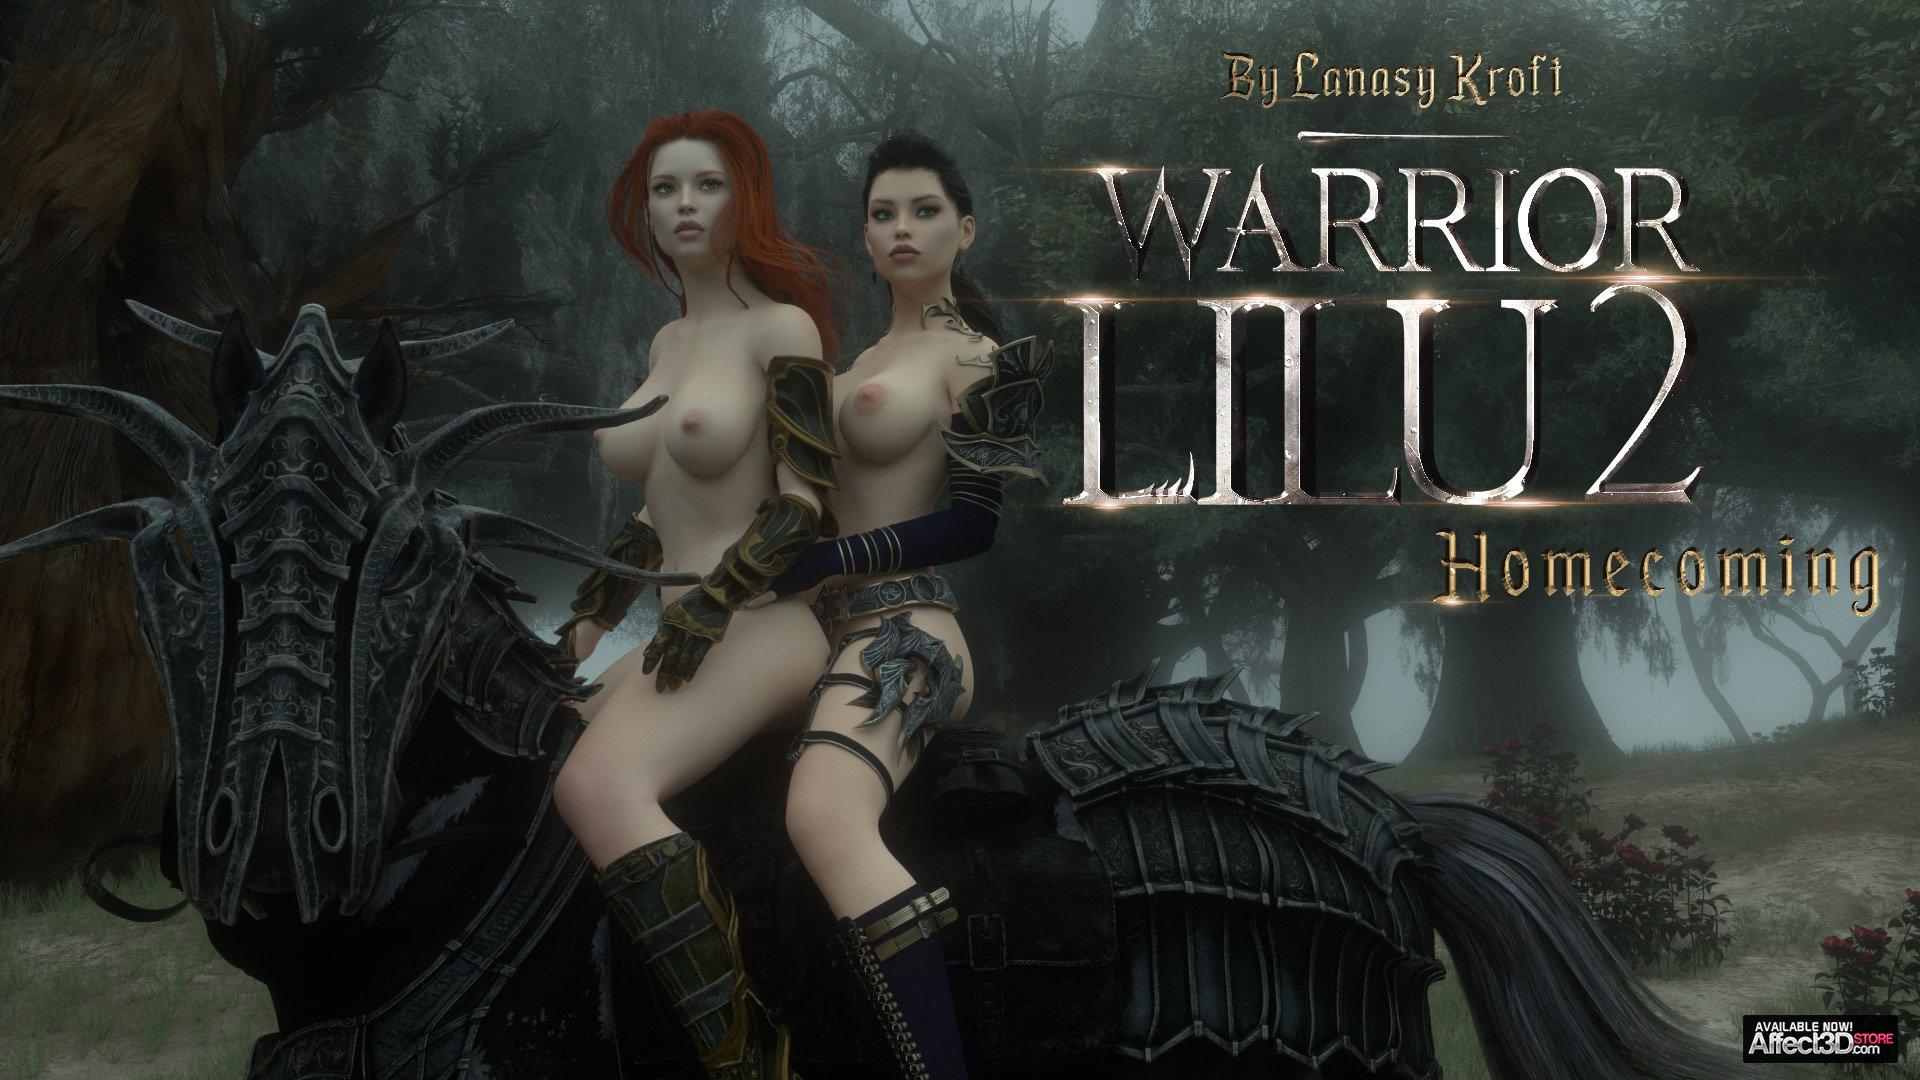 Warrior Lilu 2 - Homecoming - 情色卡漫 -